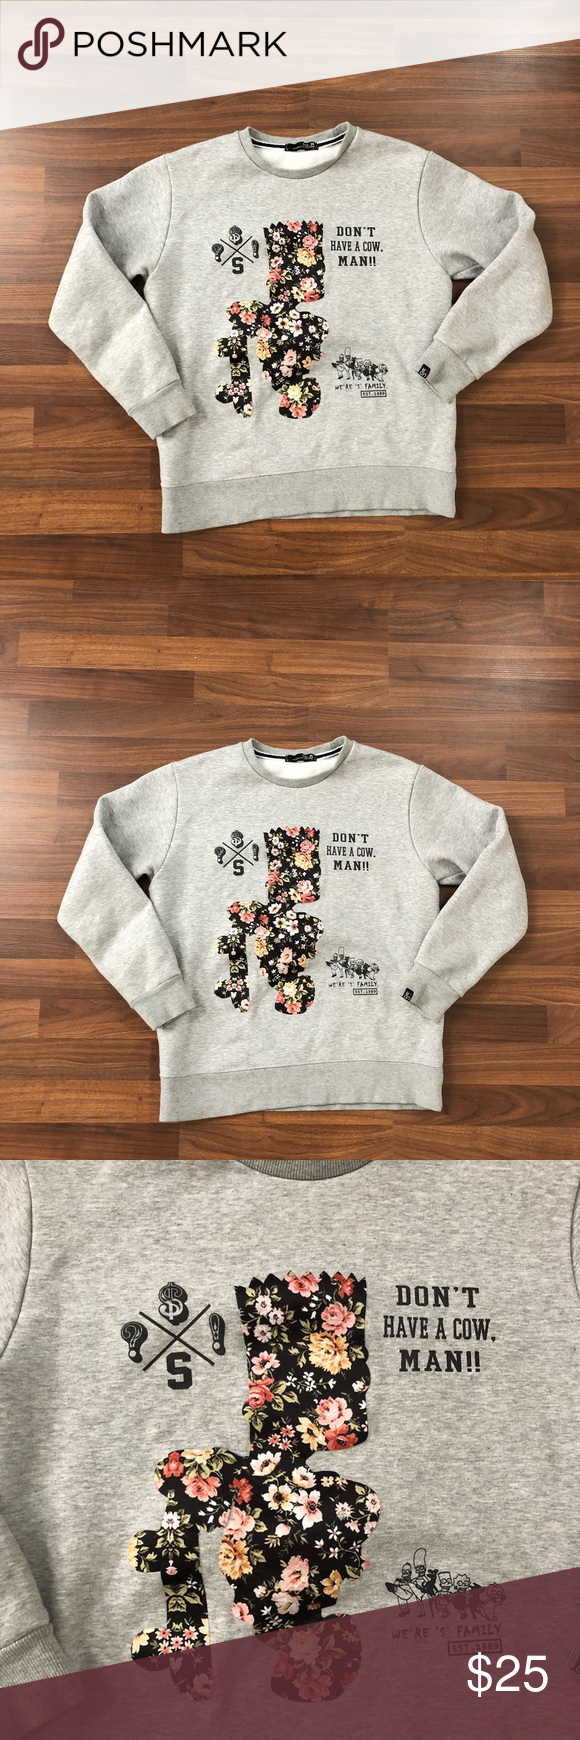 Bart Simpson Udlr Crewneck Sweatshirt Shirt Sweatshirts Hoodie Crew Neck [ 1740 x 580 Pixel ]